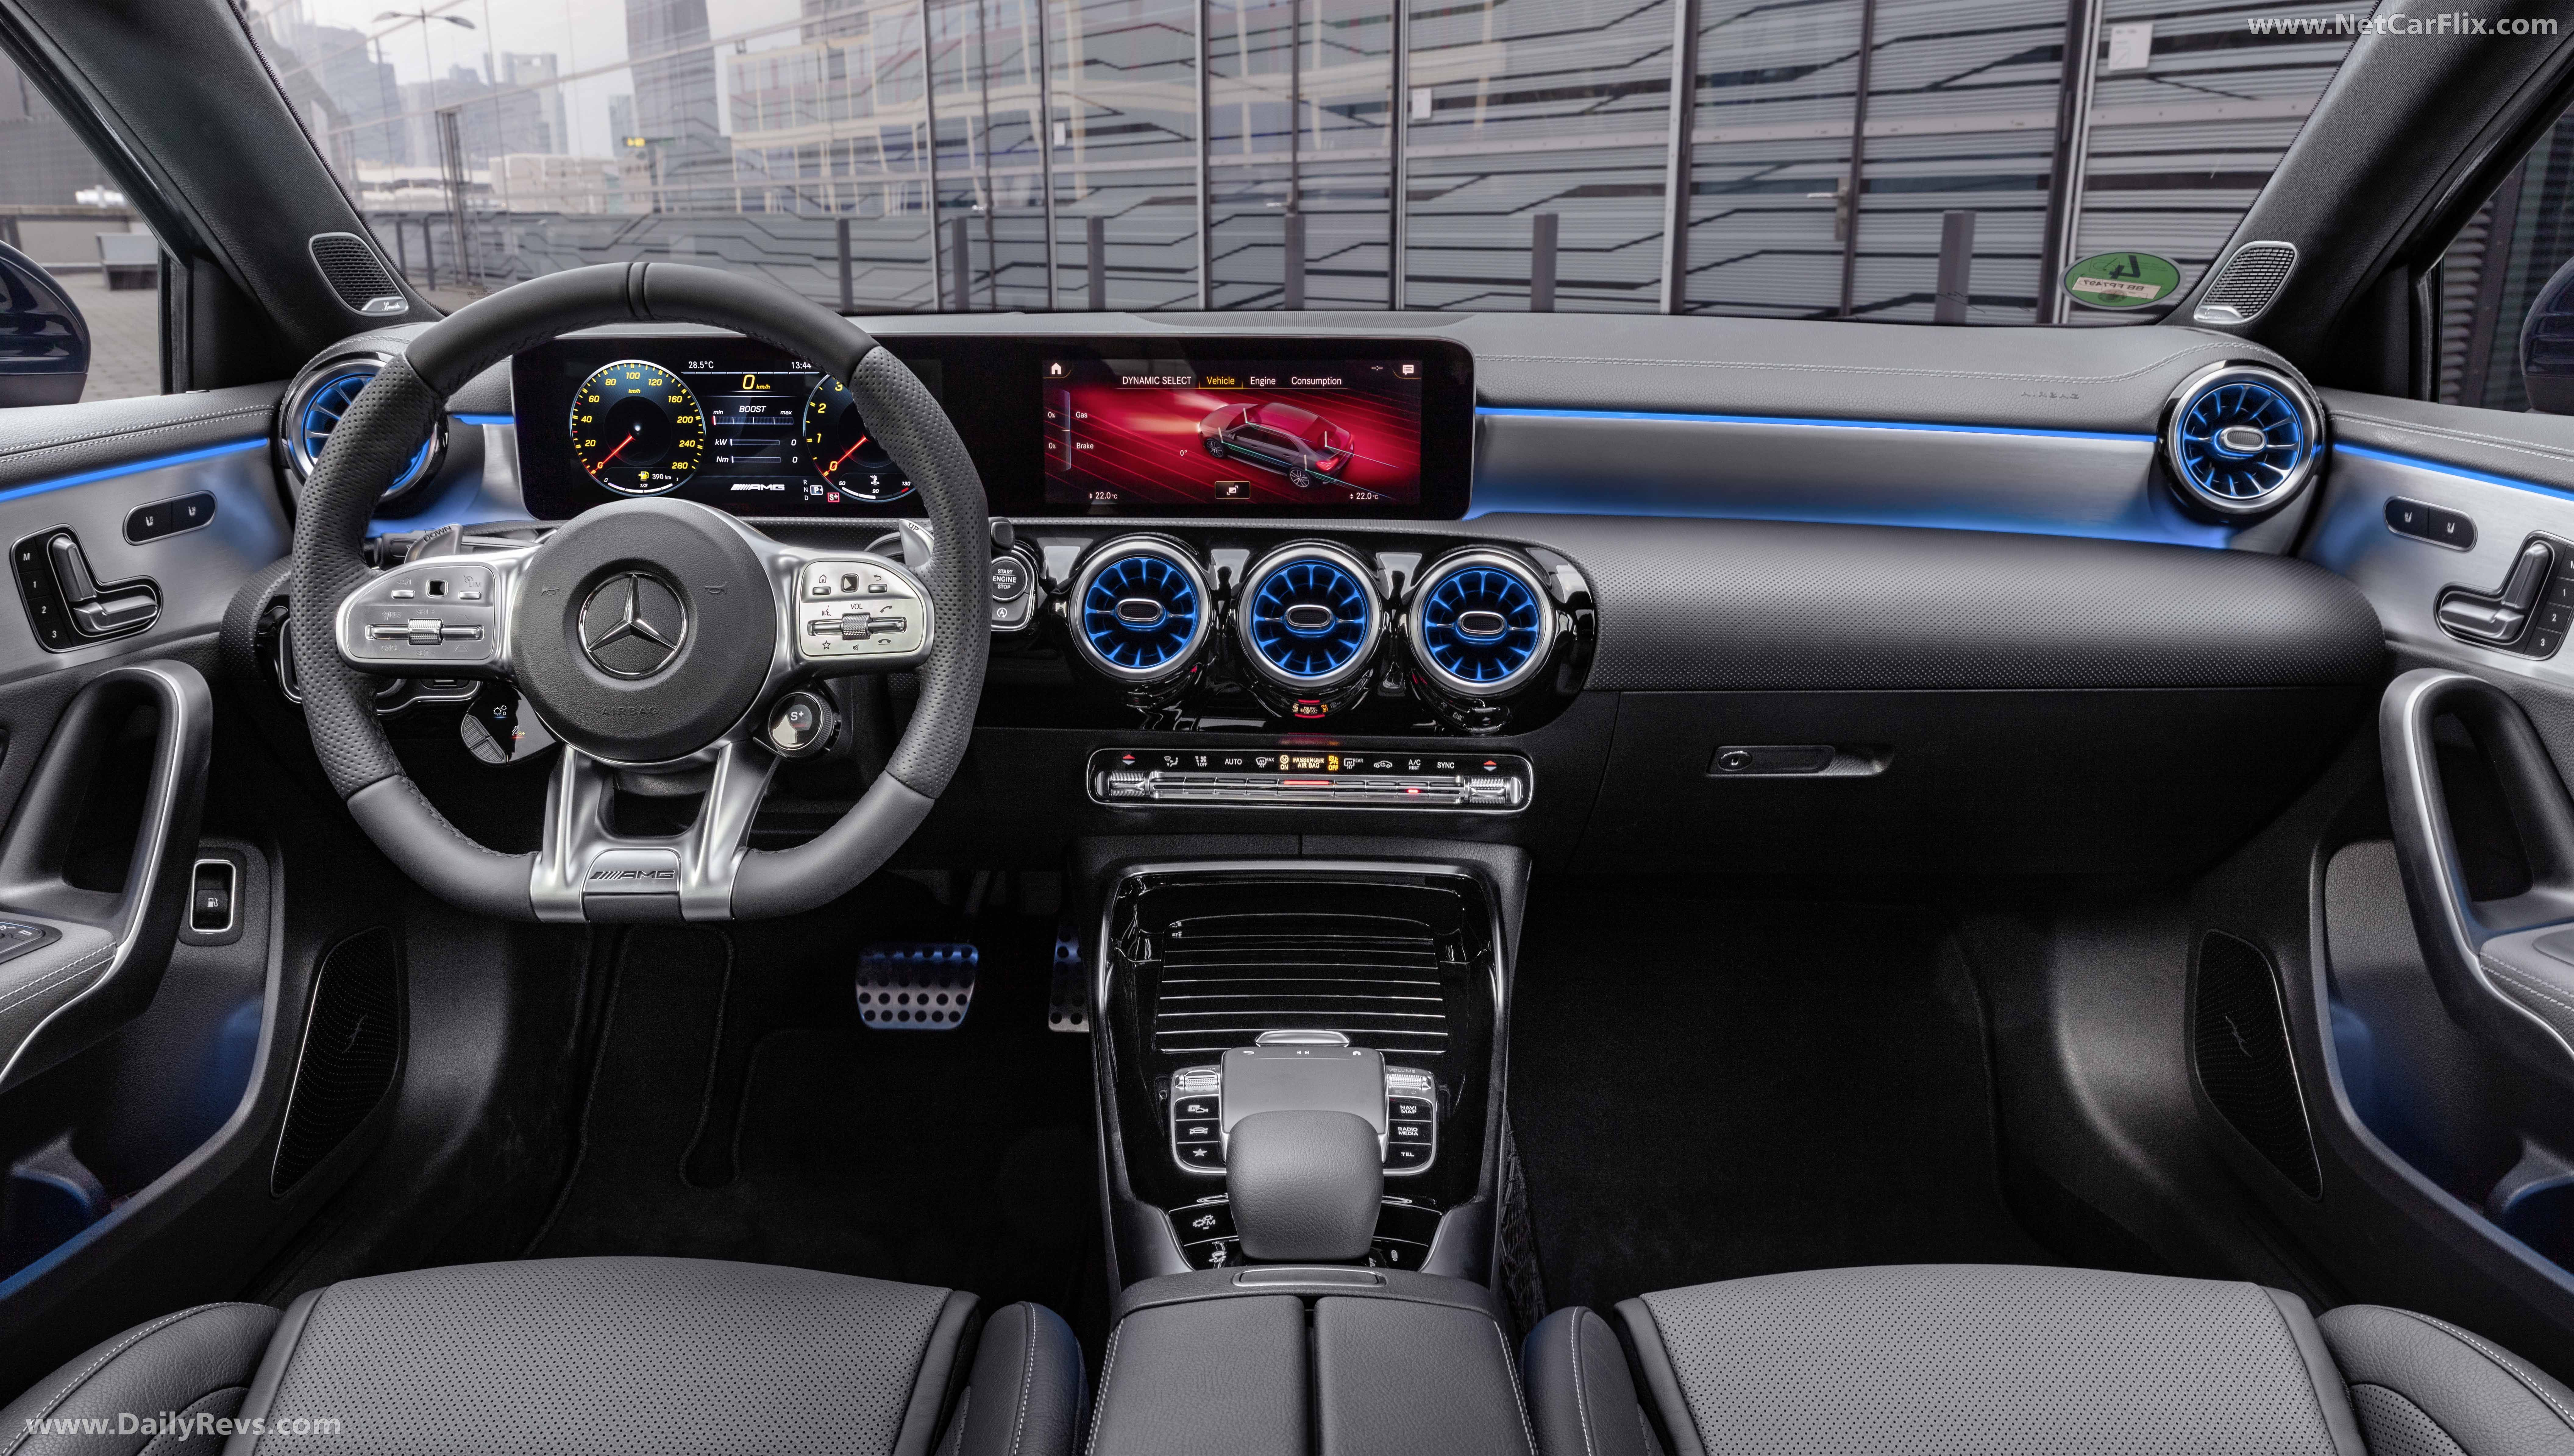 2020 Mercedes Benz A35 Amg 4matic Sedan Hd Pictures Videos